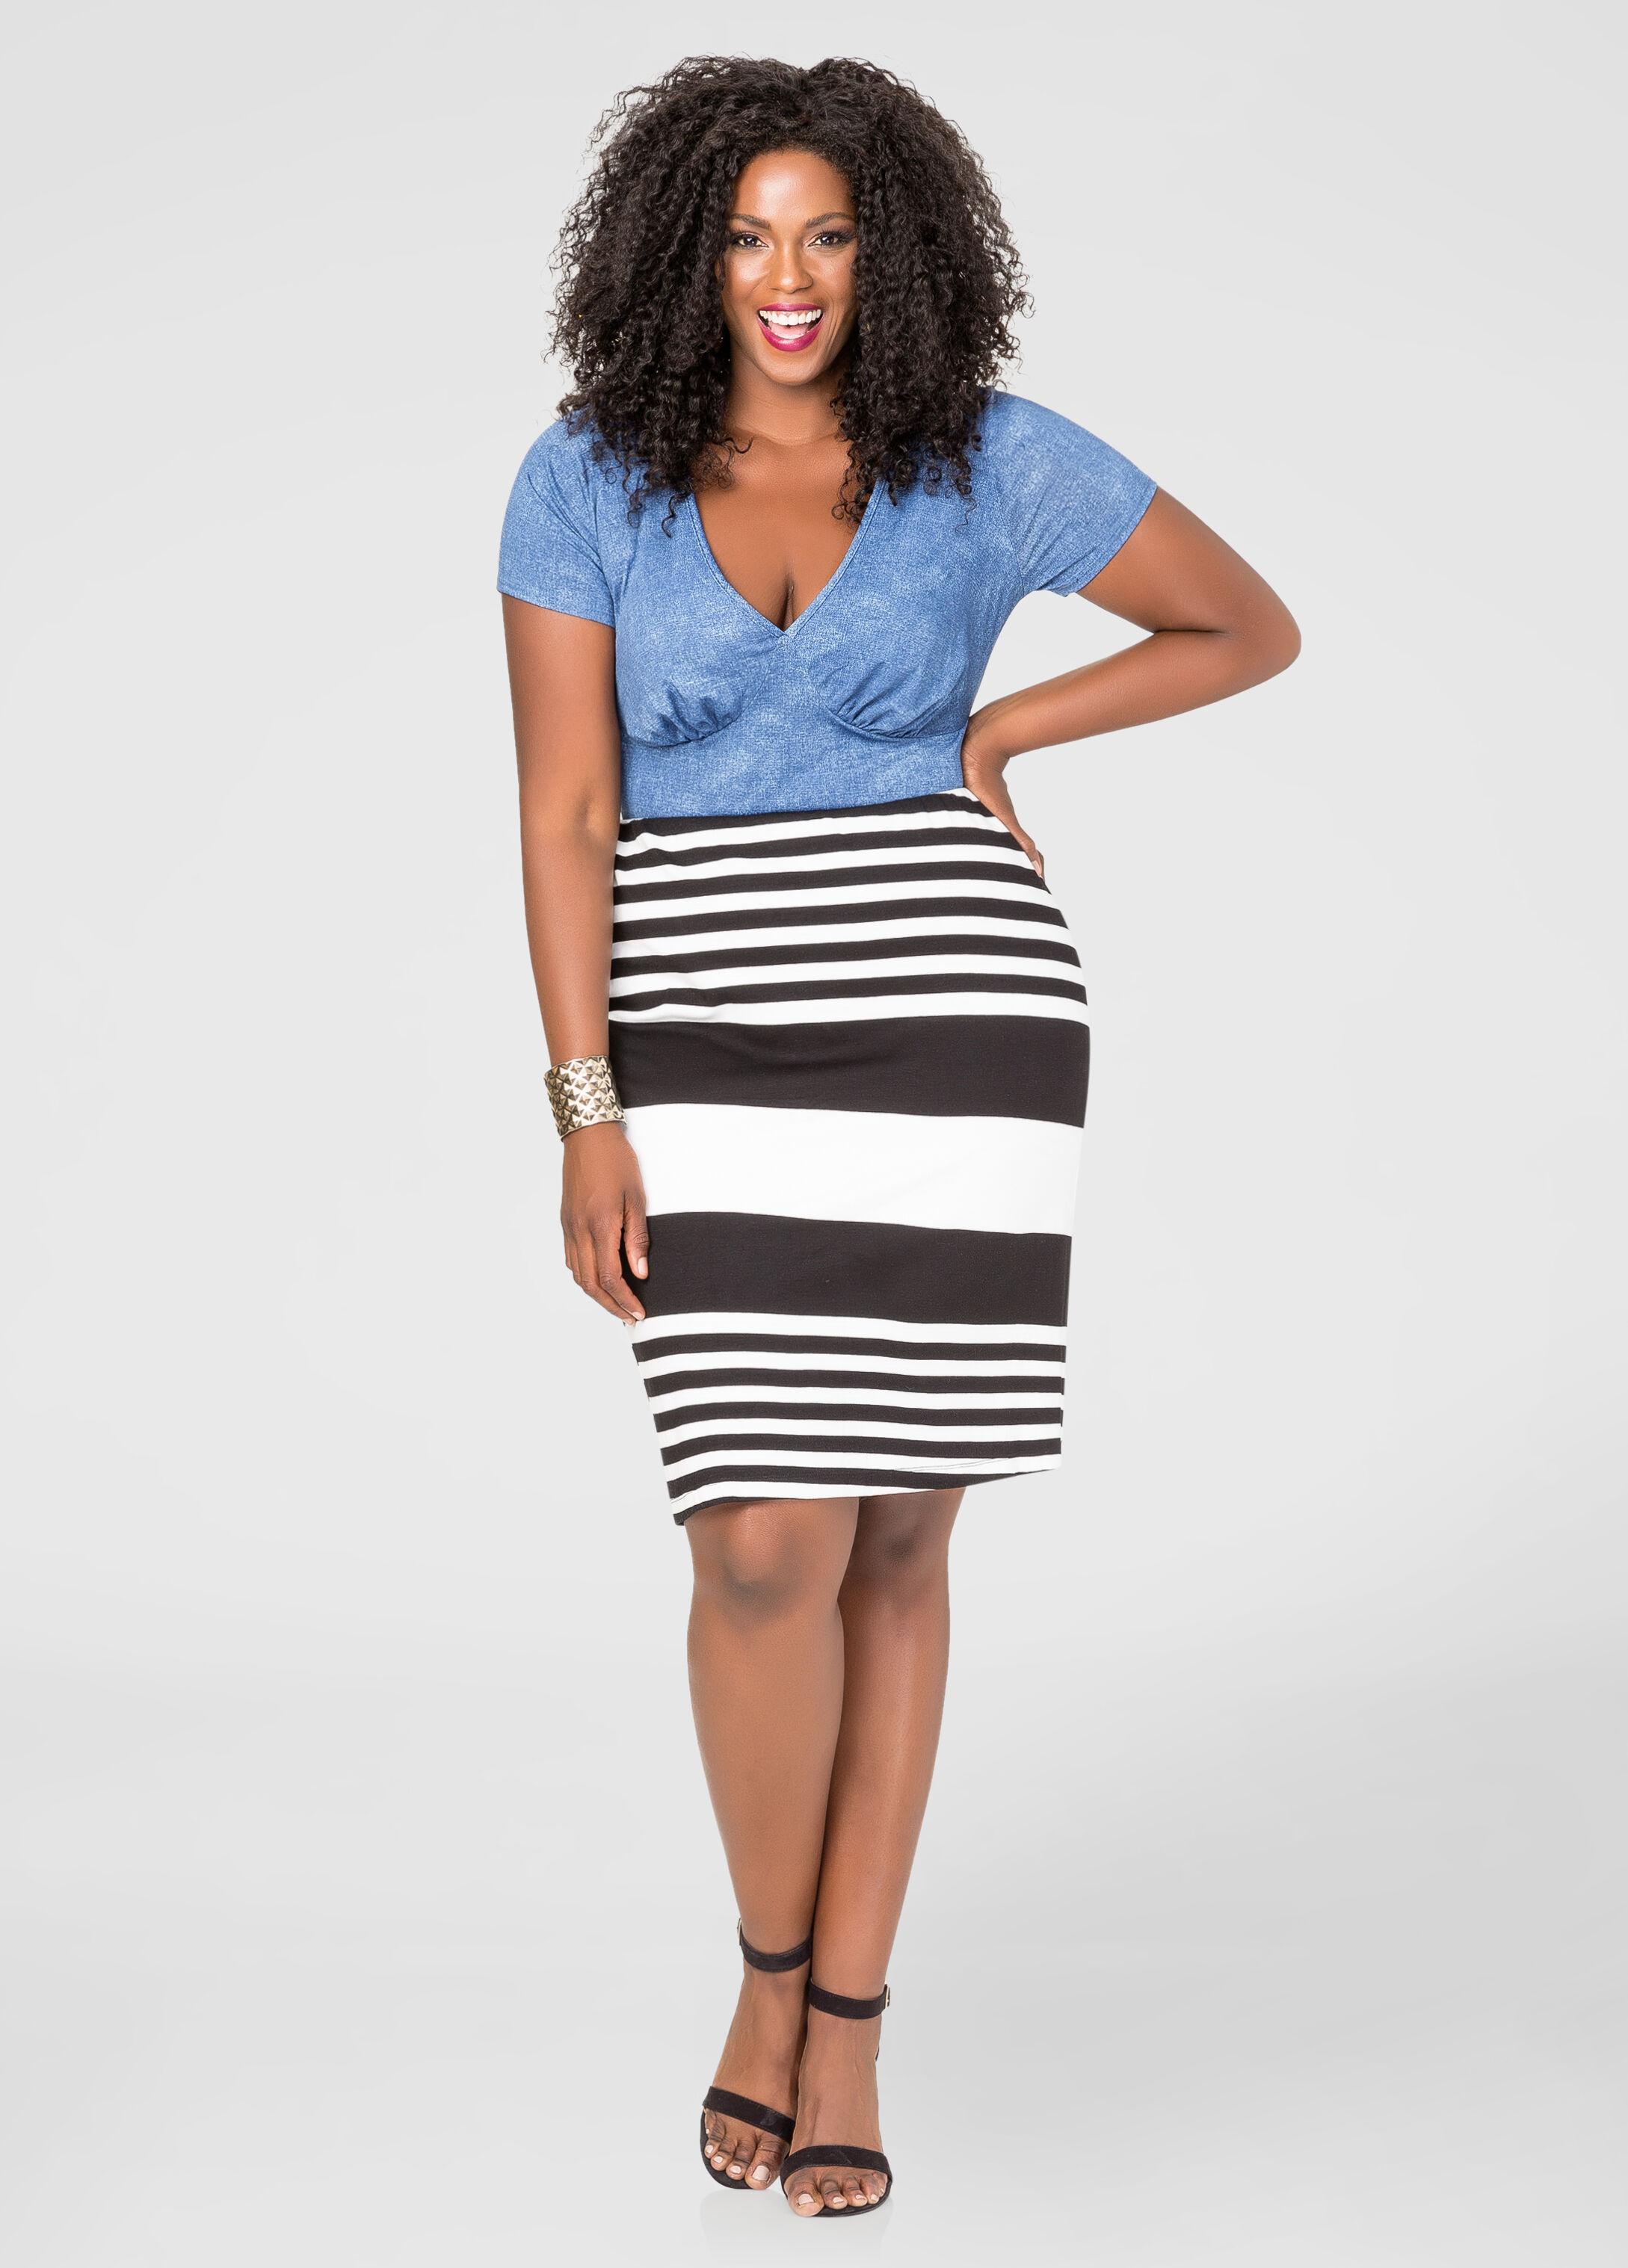 pics for gt pencil skirt plus size